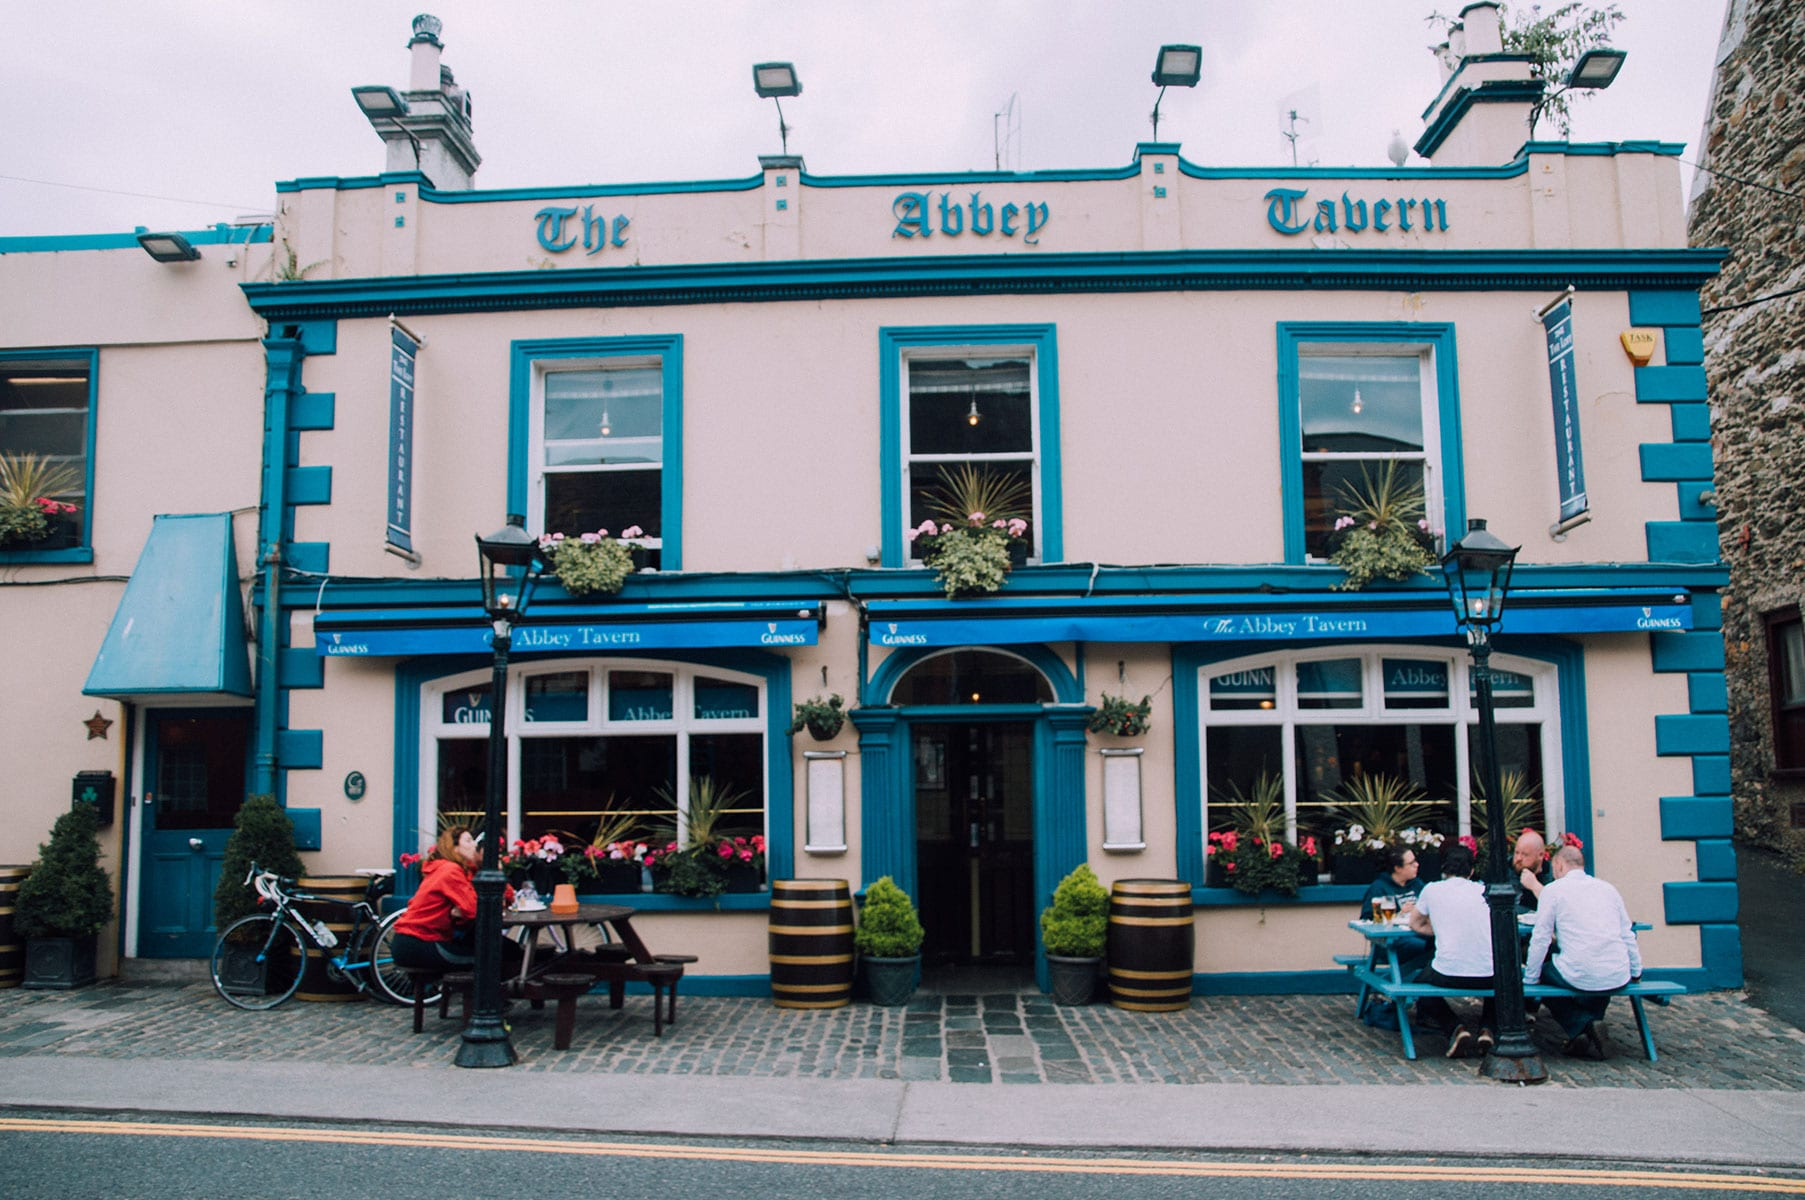 voyage-dublin-howth-abbey-tavern